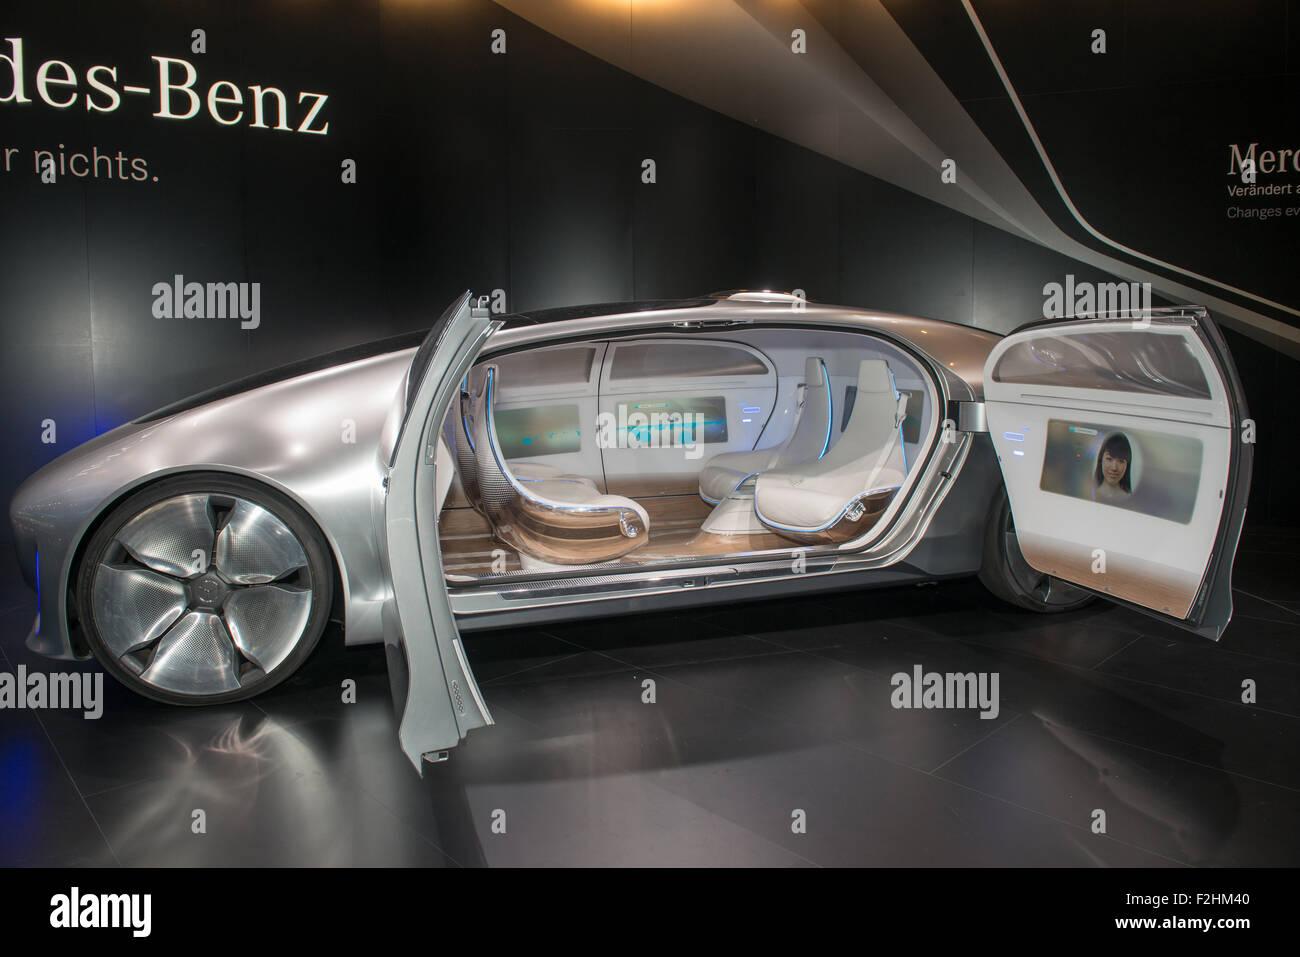 Frankfurt international motor show (IAA) 2015. Mercedes-Benz F 015 Concept car- world premiere - Stock Image